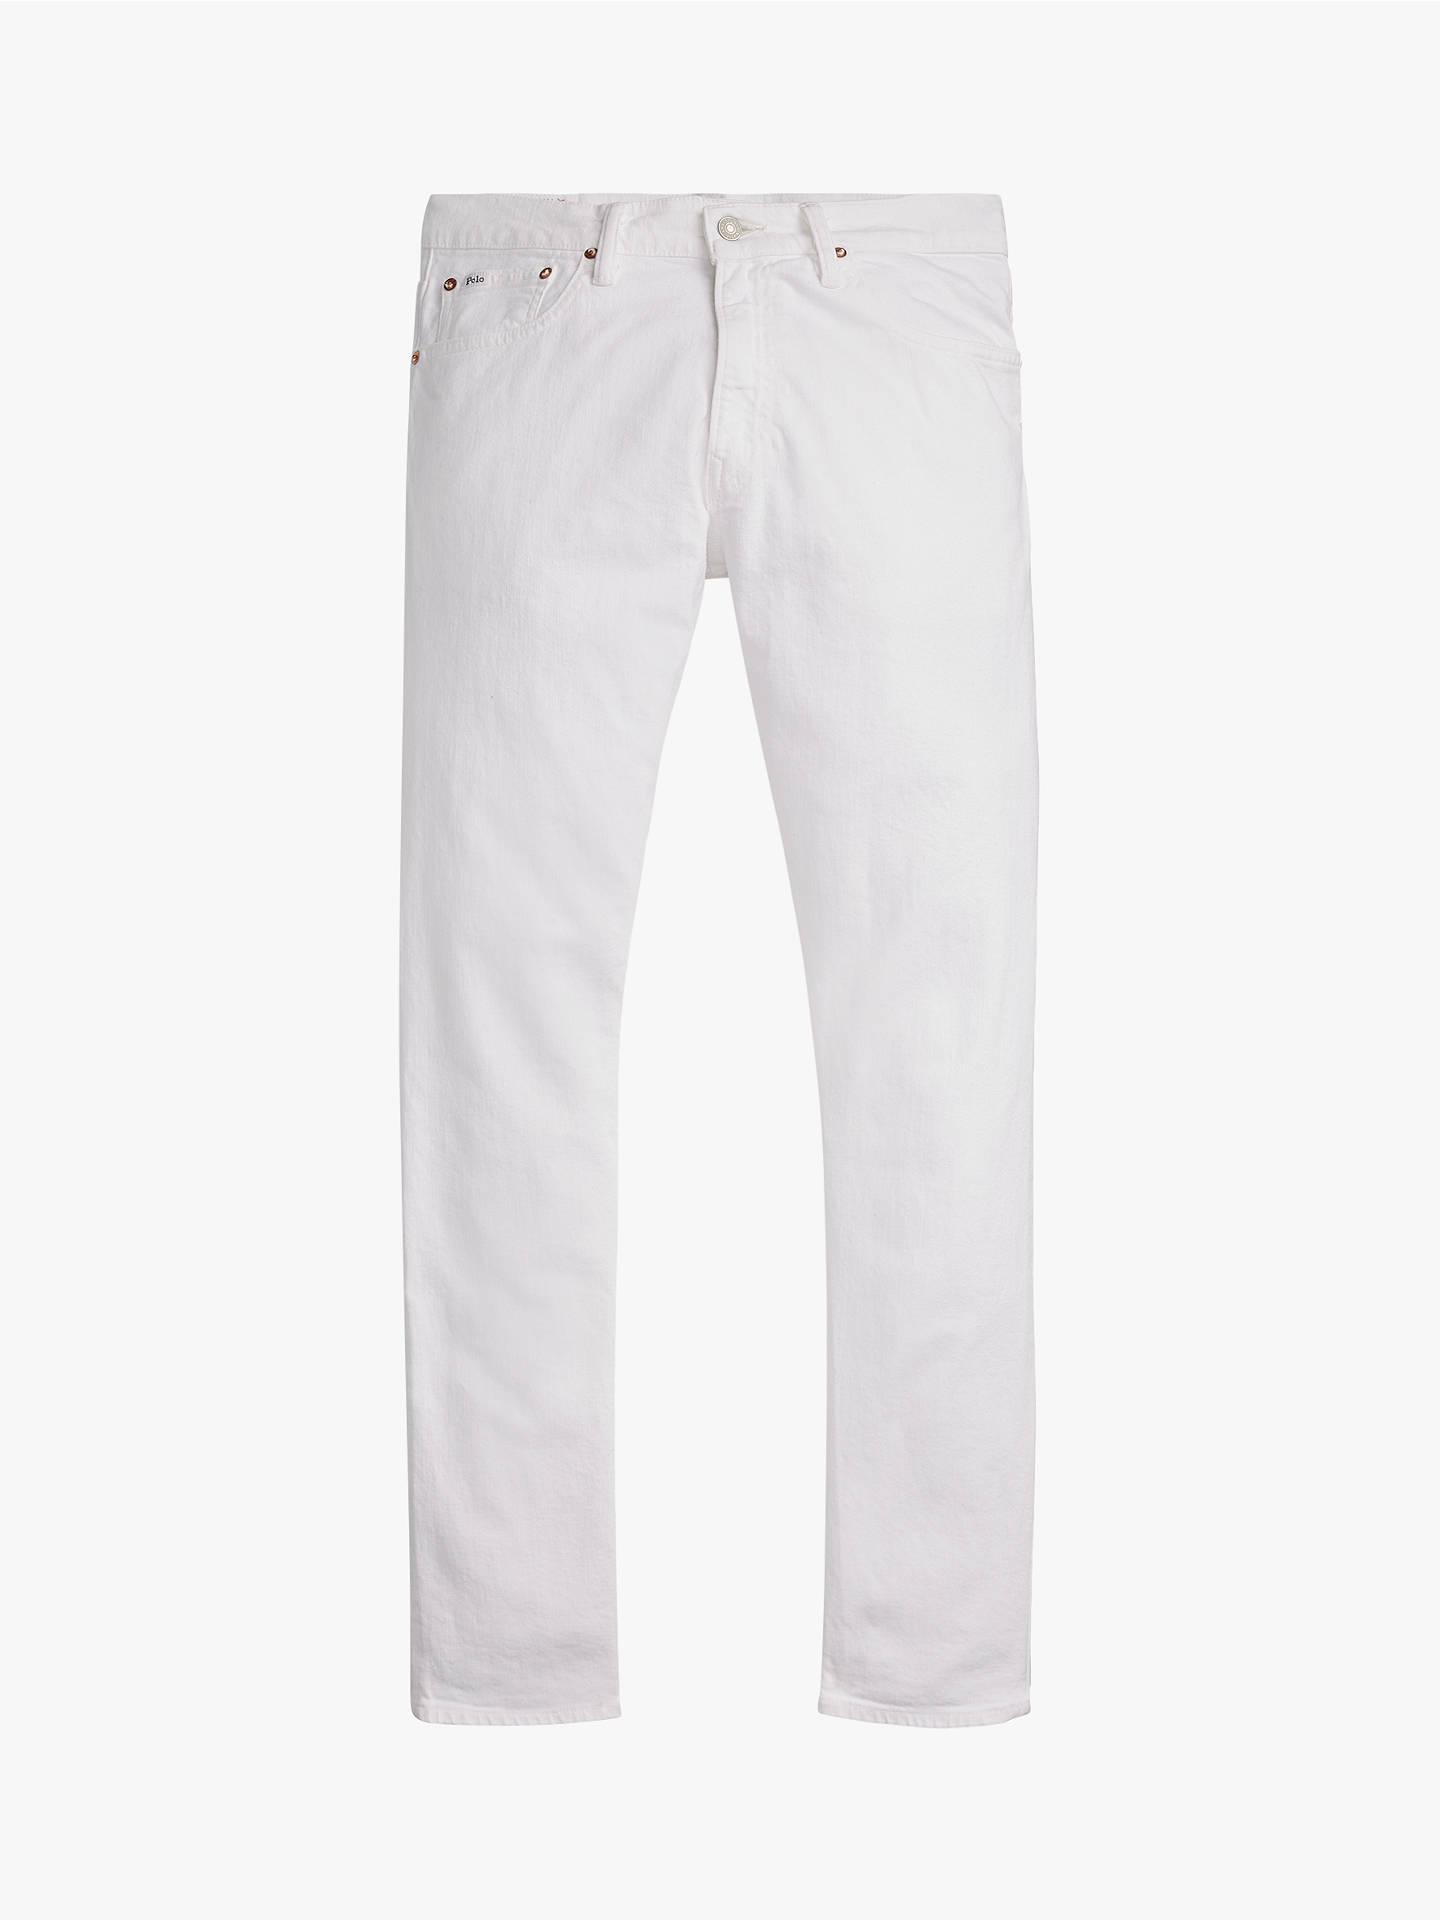 557f34c11595 ... Buy Polo Ralph Lauren Sullivan Slim Fit Five Pocket Jeans